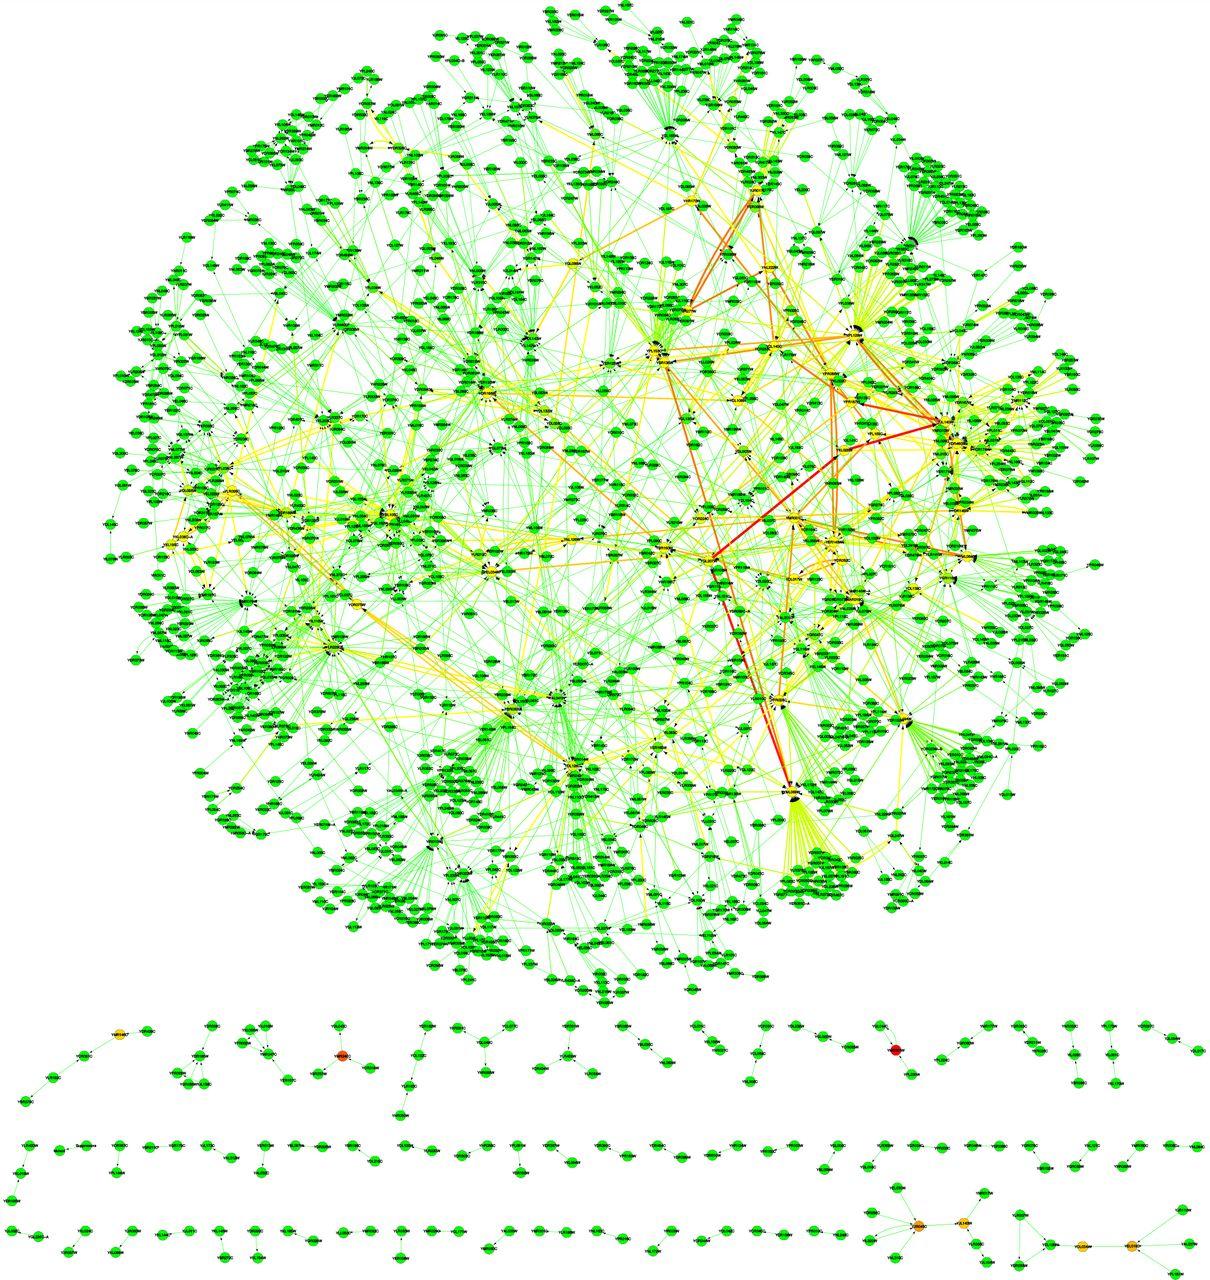 A genome wide dosage suppressor network reveals genetic